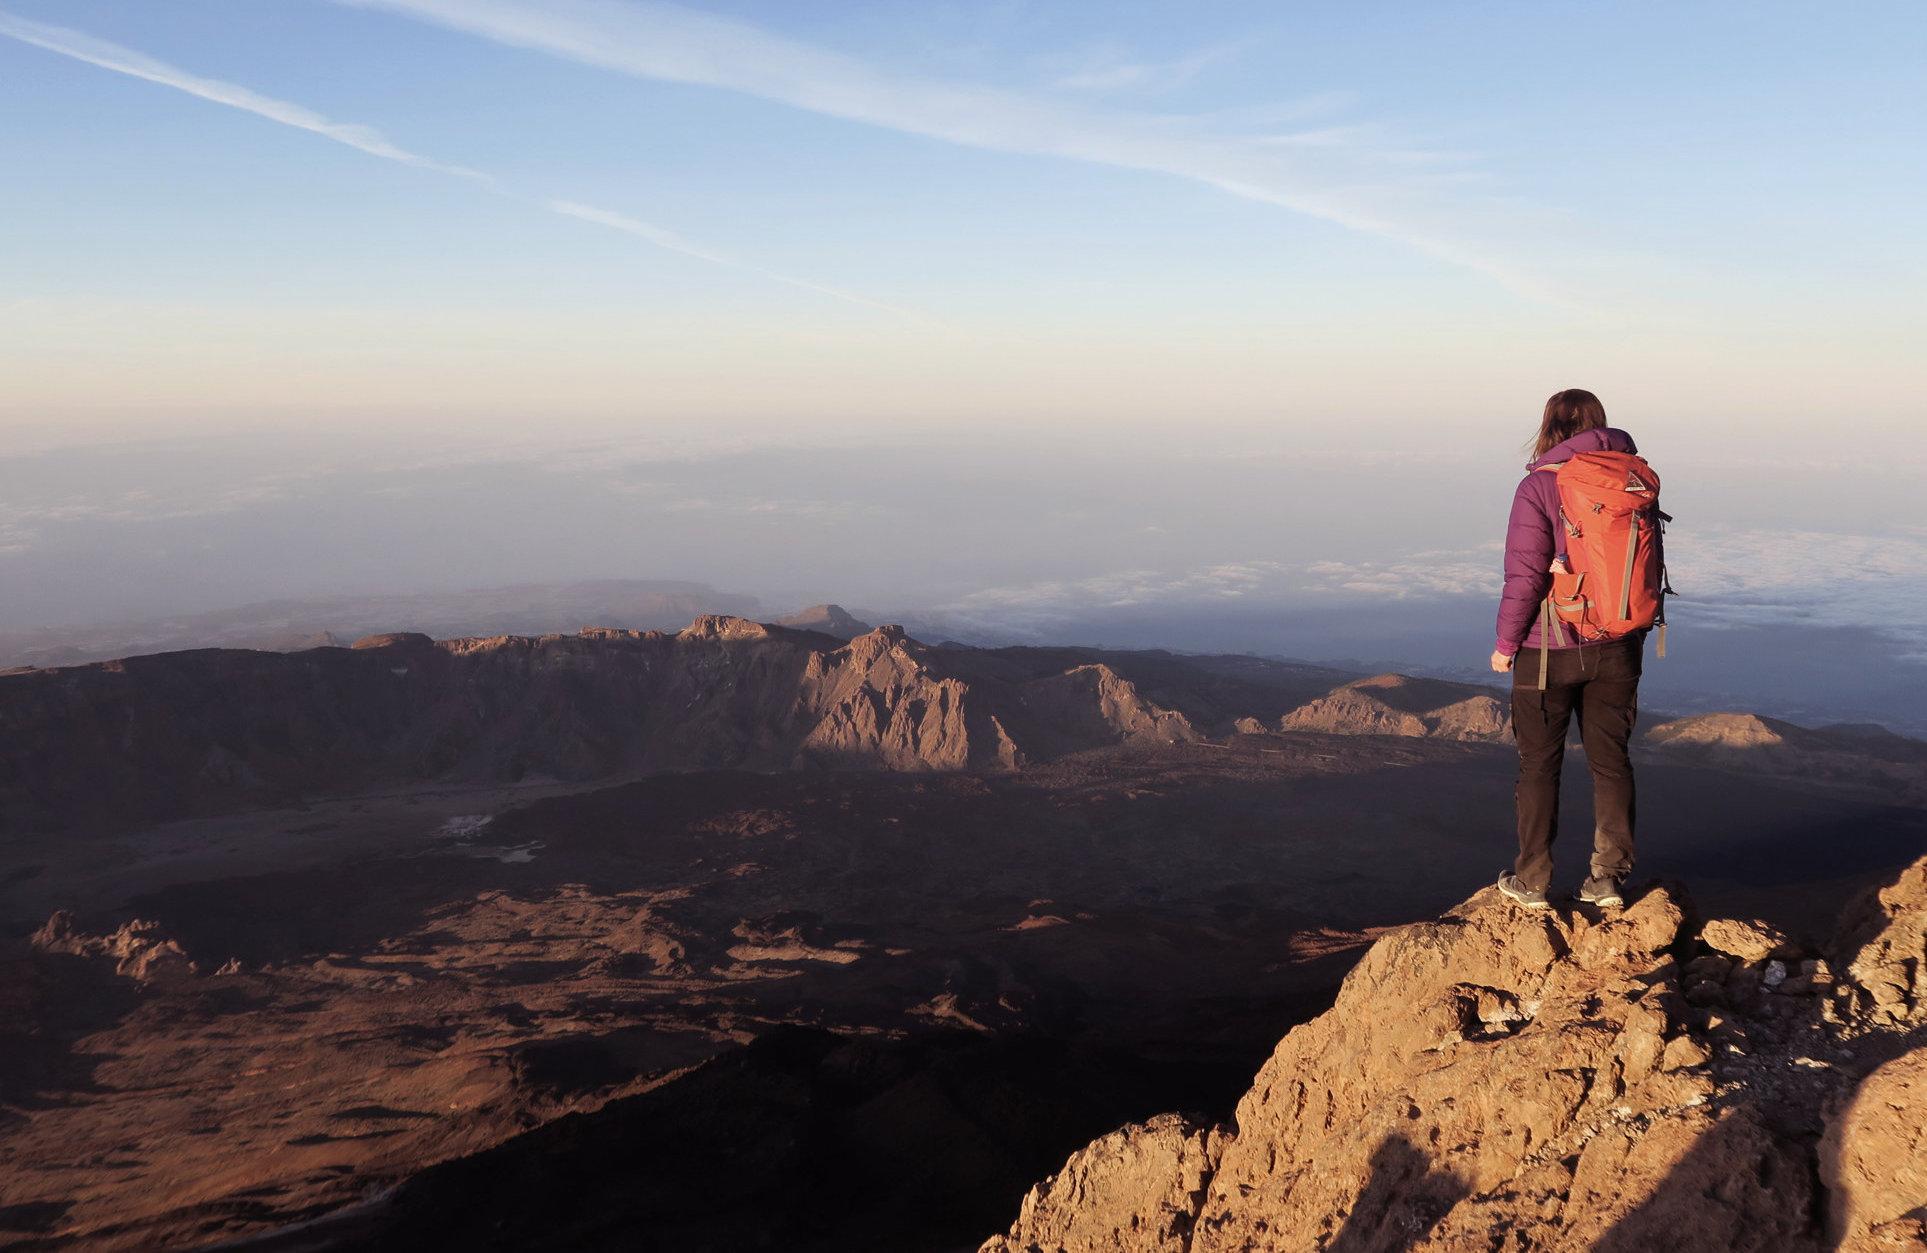 Auf dem Gipfel des Teide zum Sonnenaufgang, Wandern im Frühling